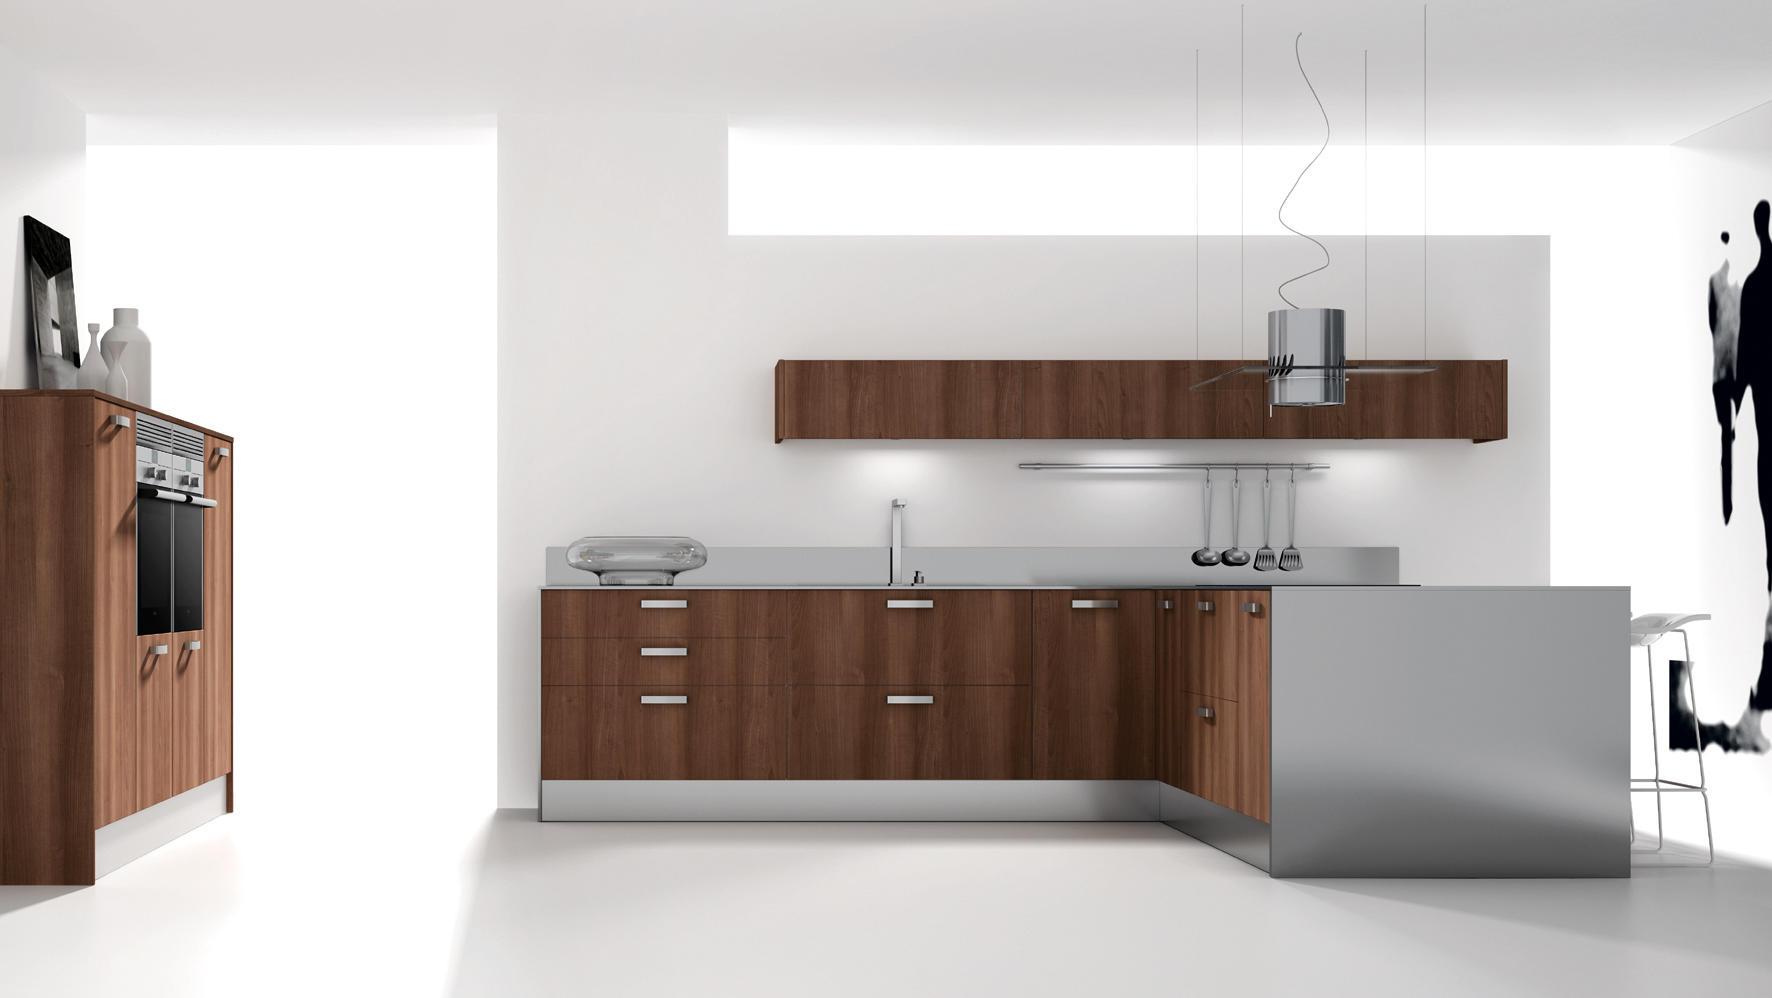 2000 acacia cucine a parete doca architonic - Cucine a parete ...